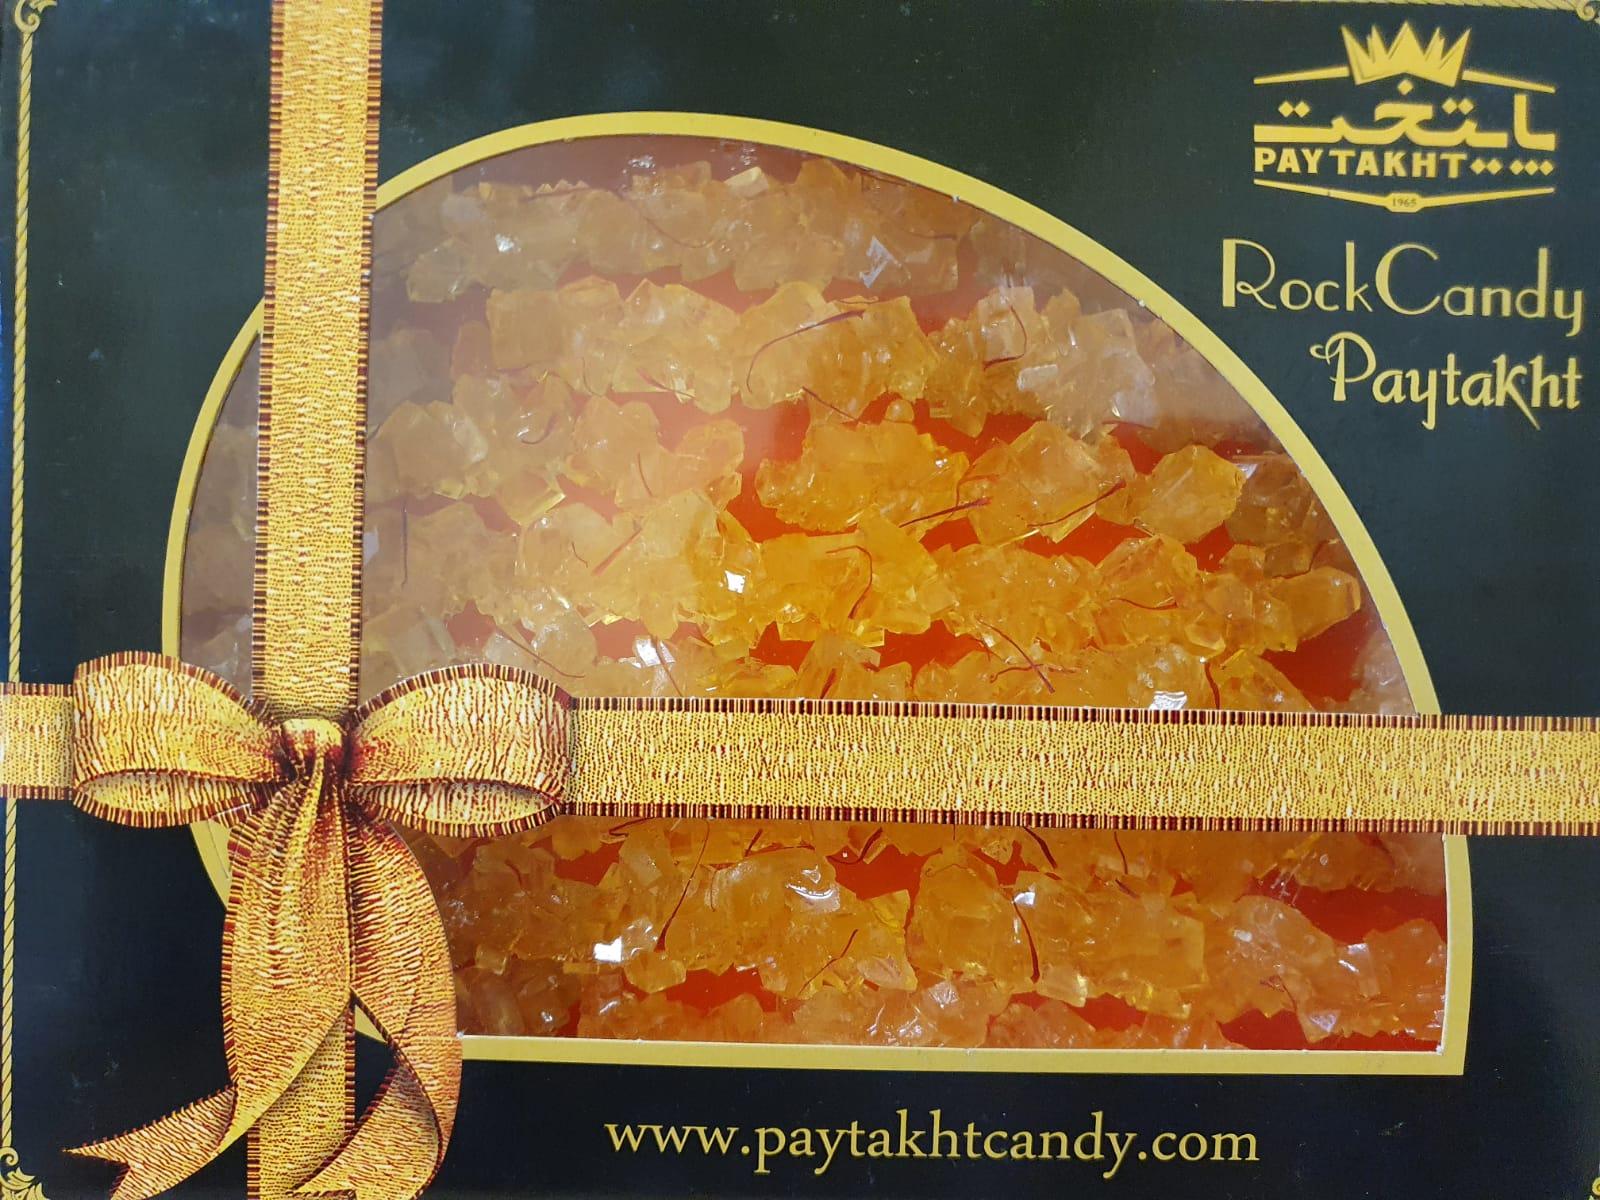 Saffran Rock Candy